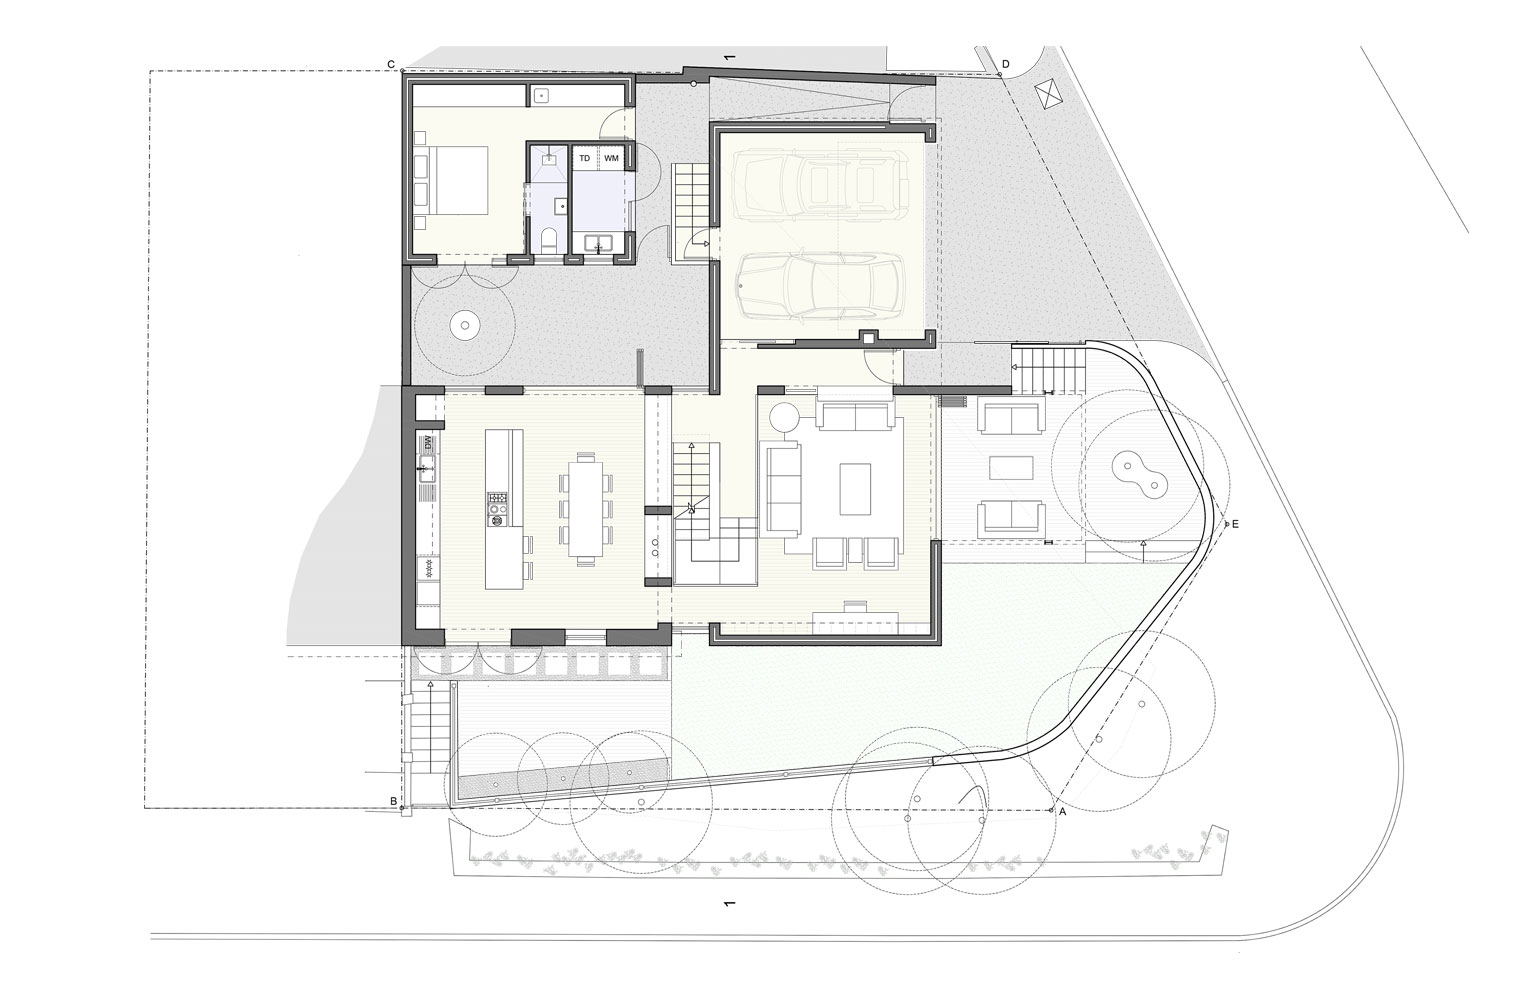 27 Clovelly Avenue - Ground Floor Plan